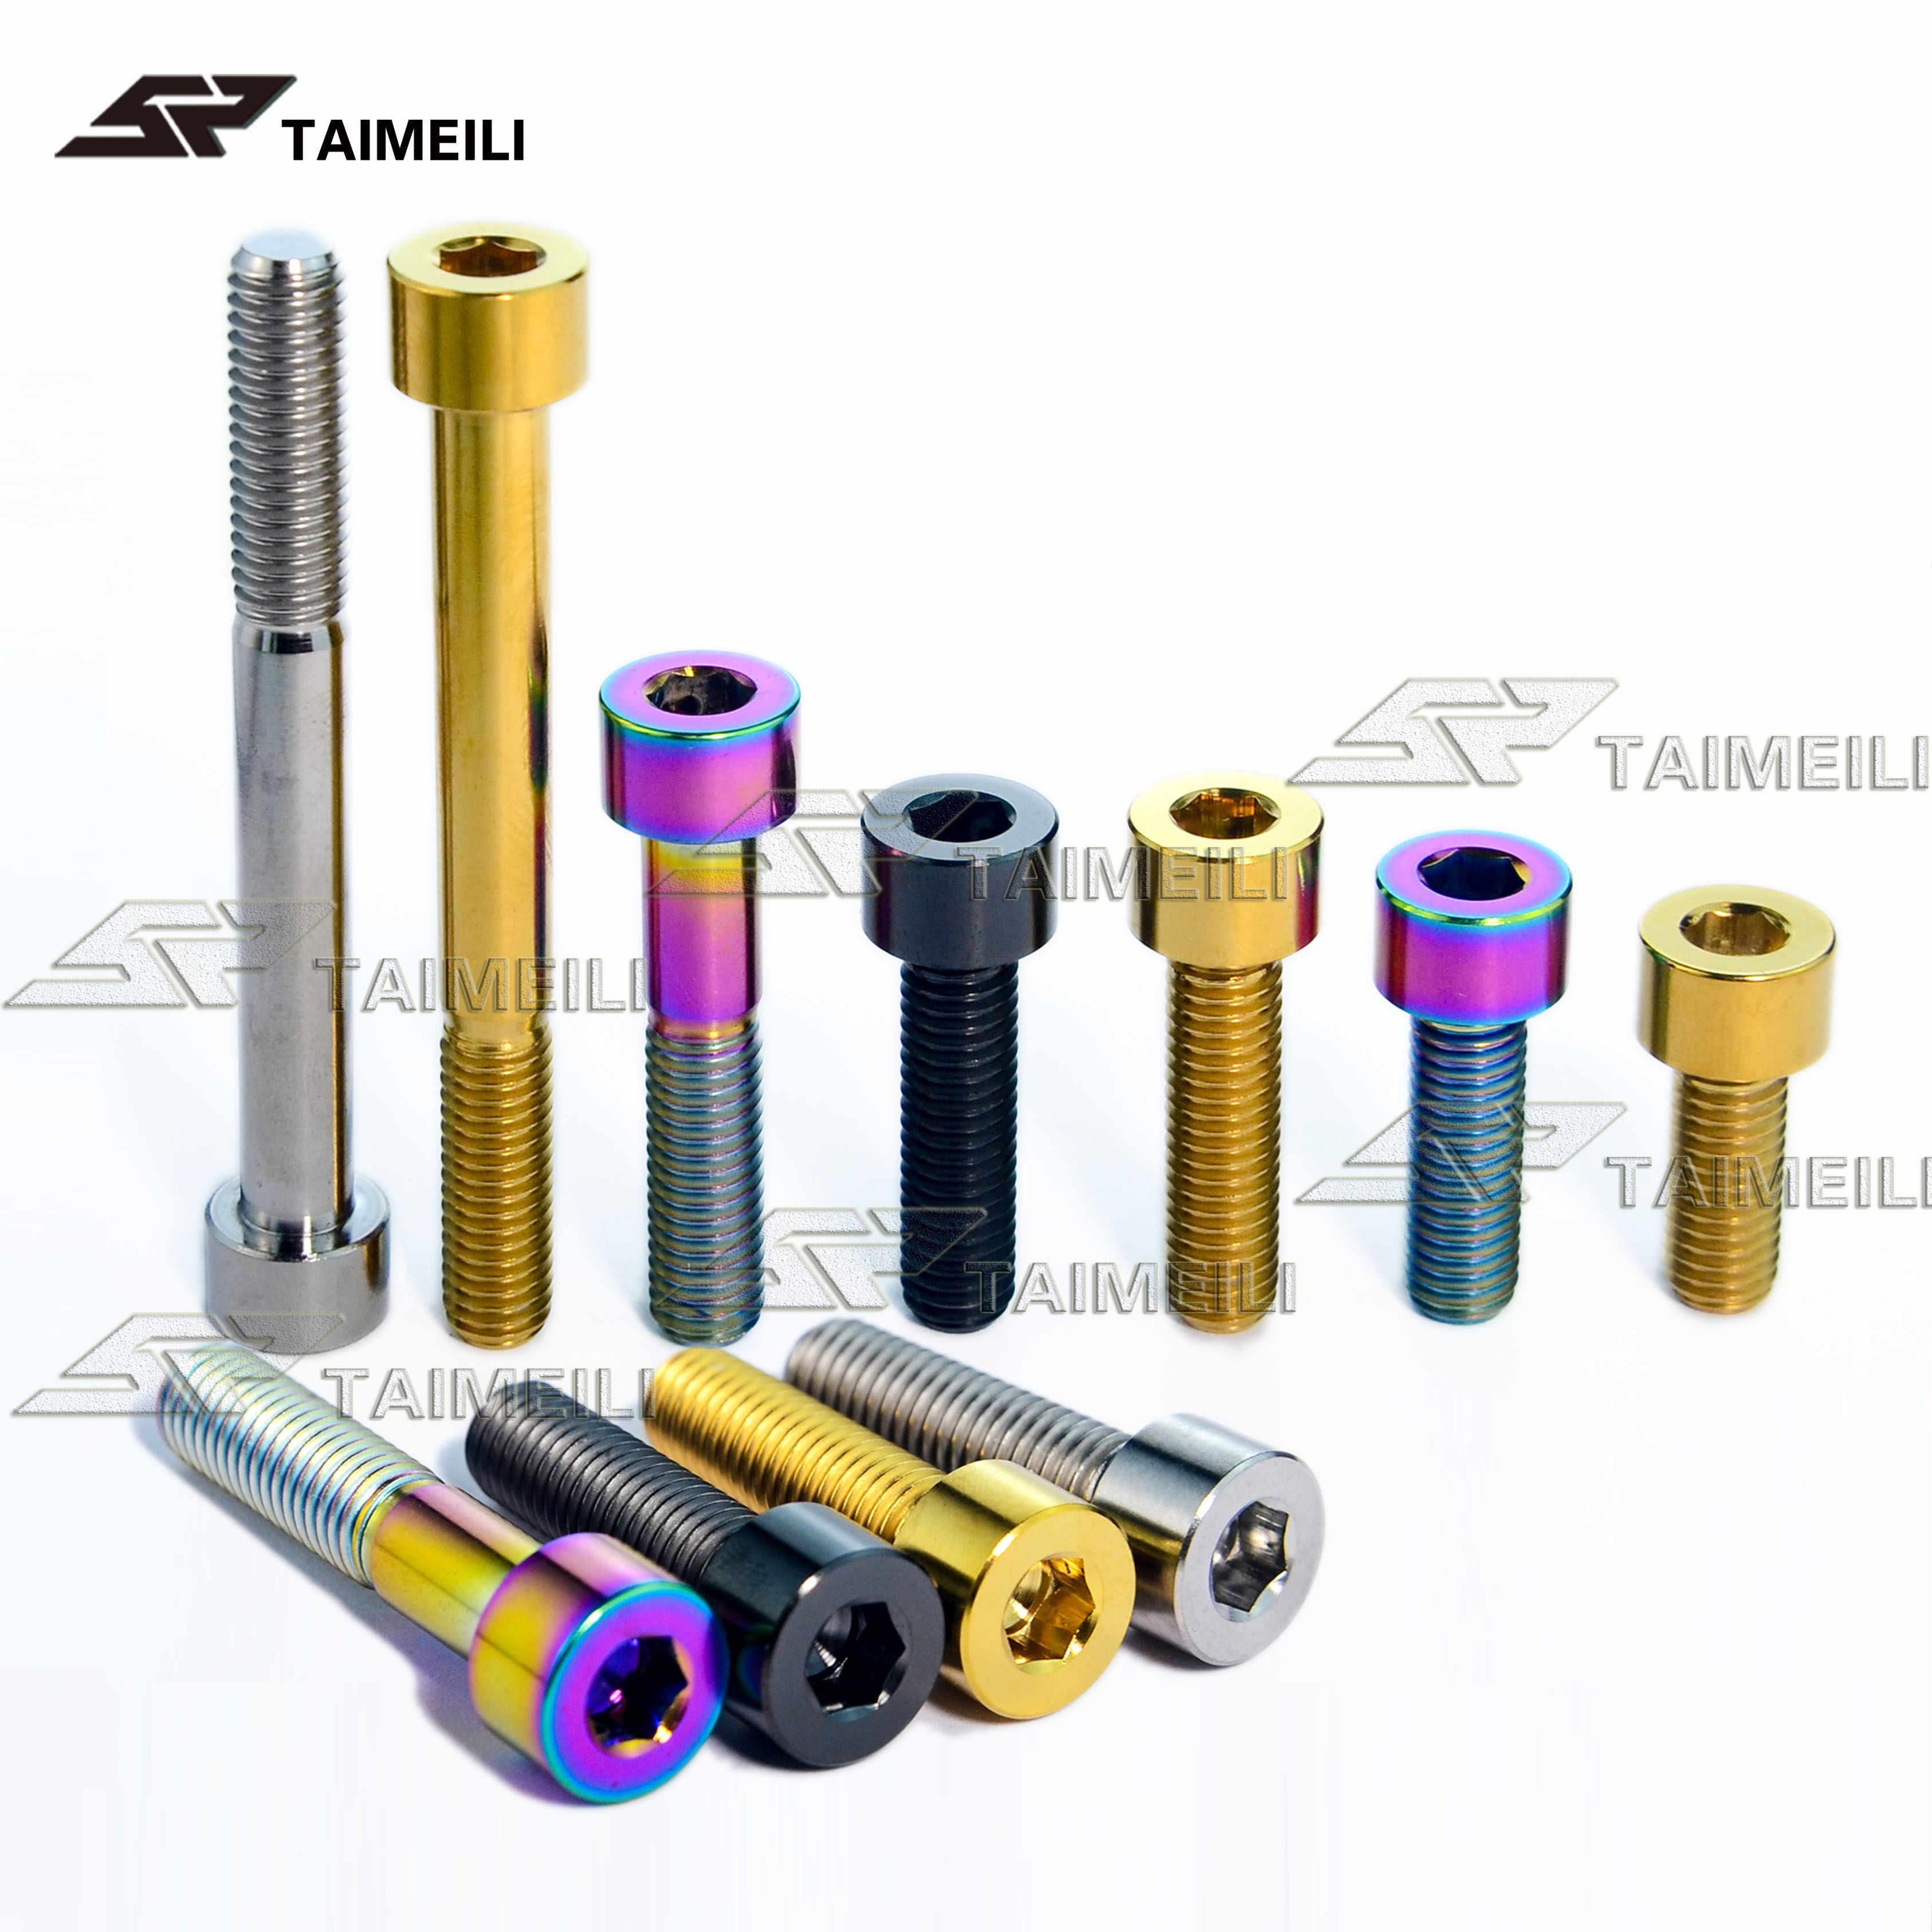 Titanium Ti  Bolt Screw M8x15 20 25 30 35 40 45 50mm Bike Parts Hex Fasteners